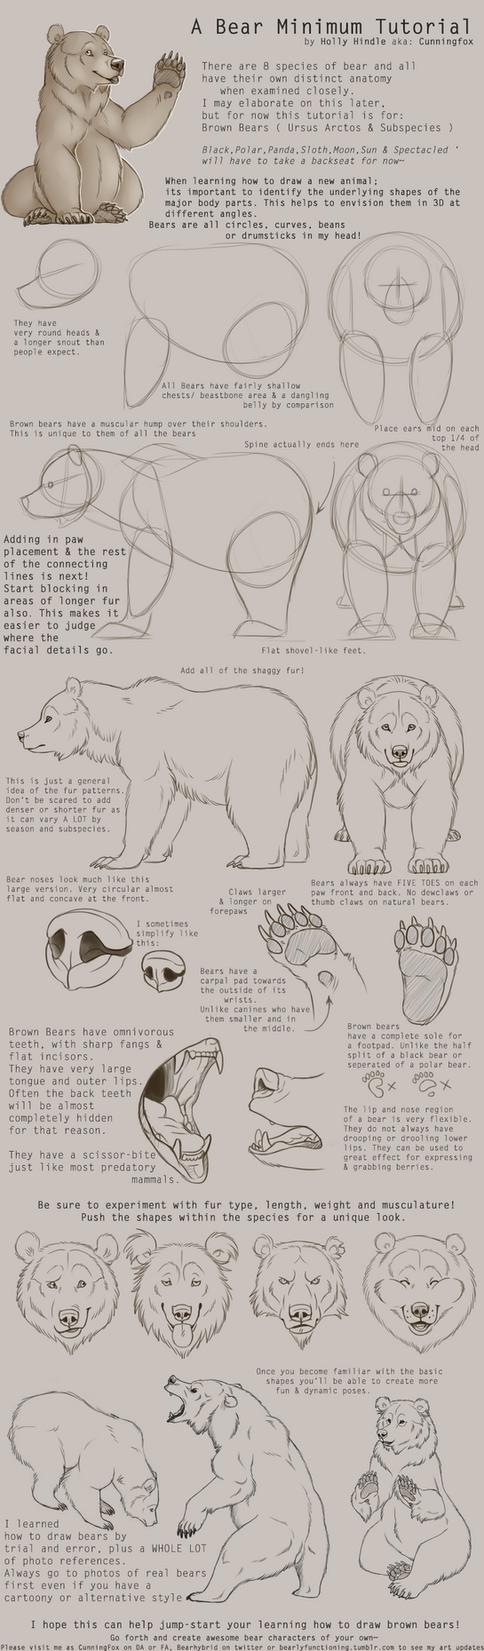 Brown Bear Tutorial by Bear-hybrid